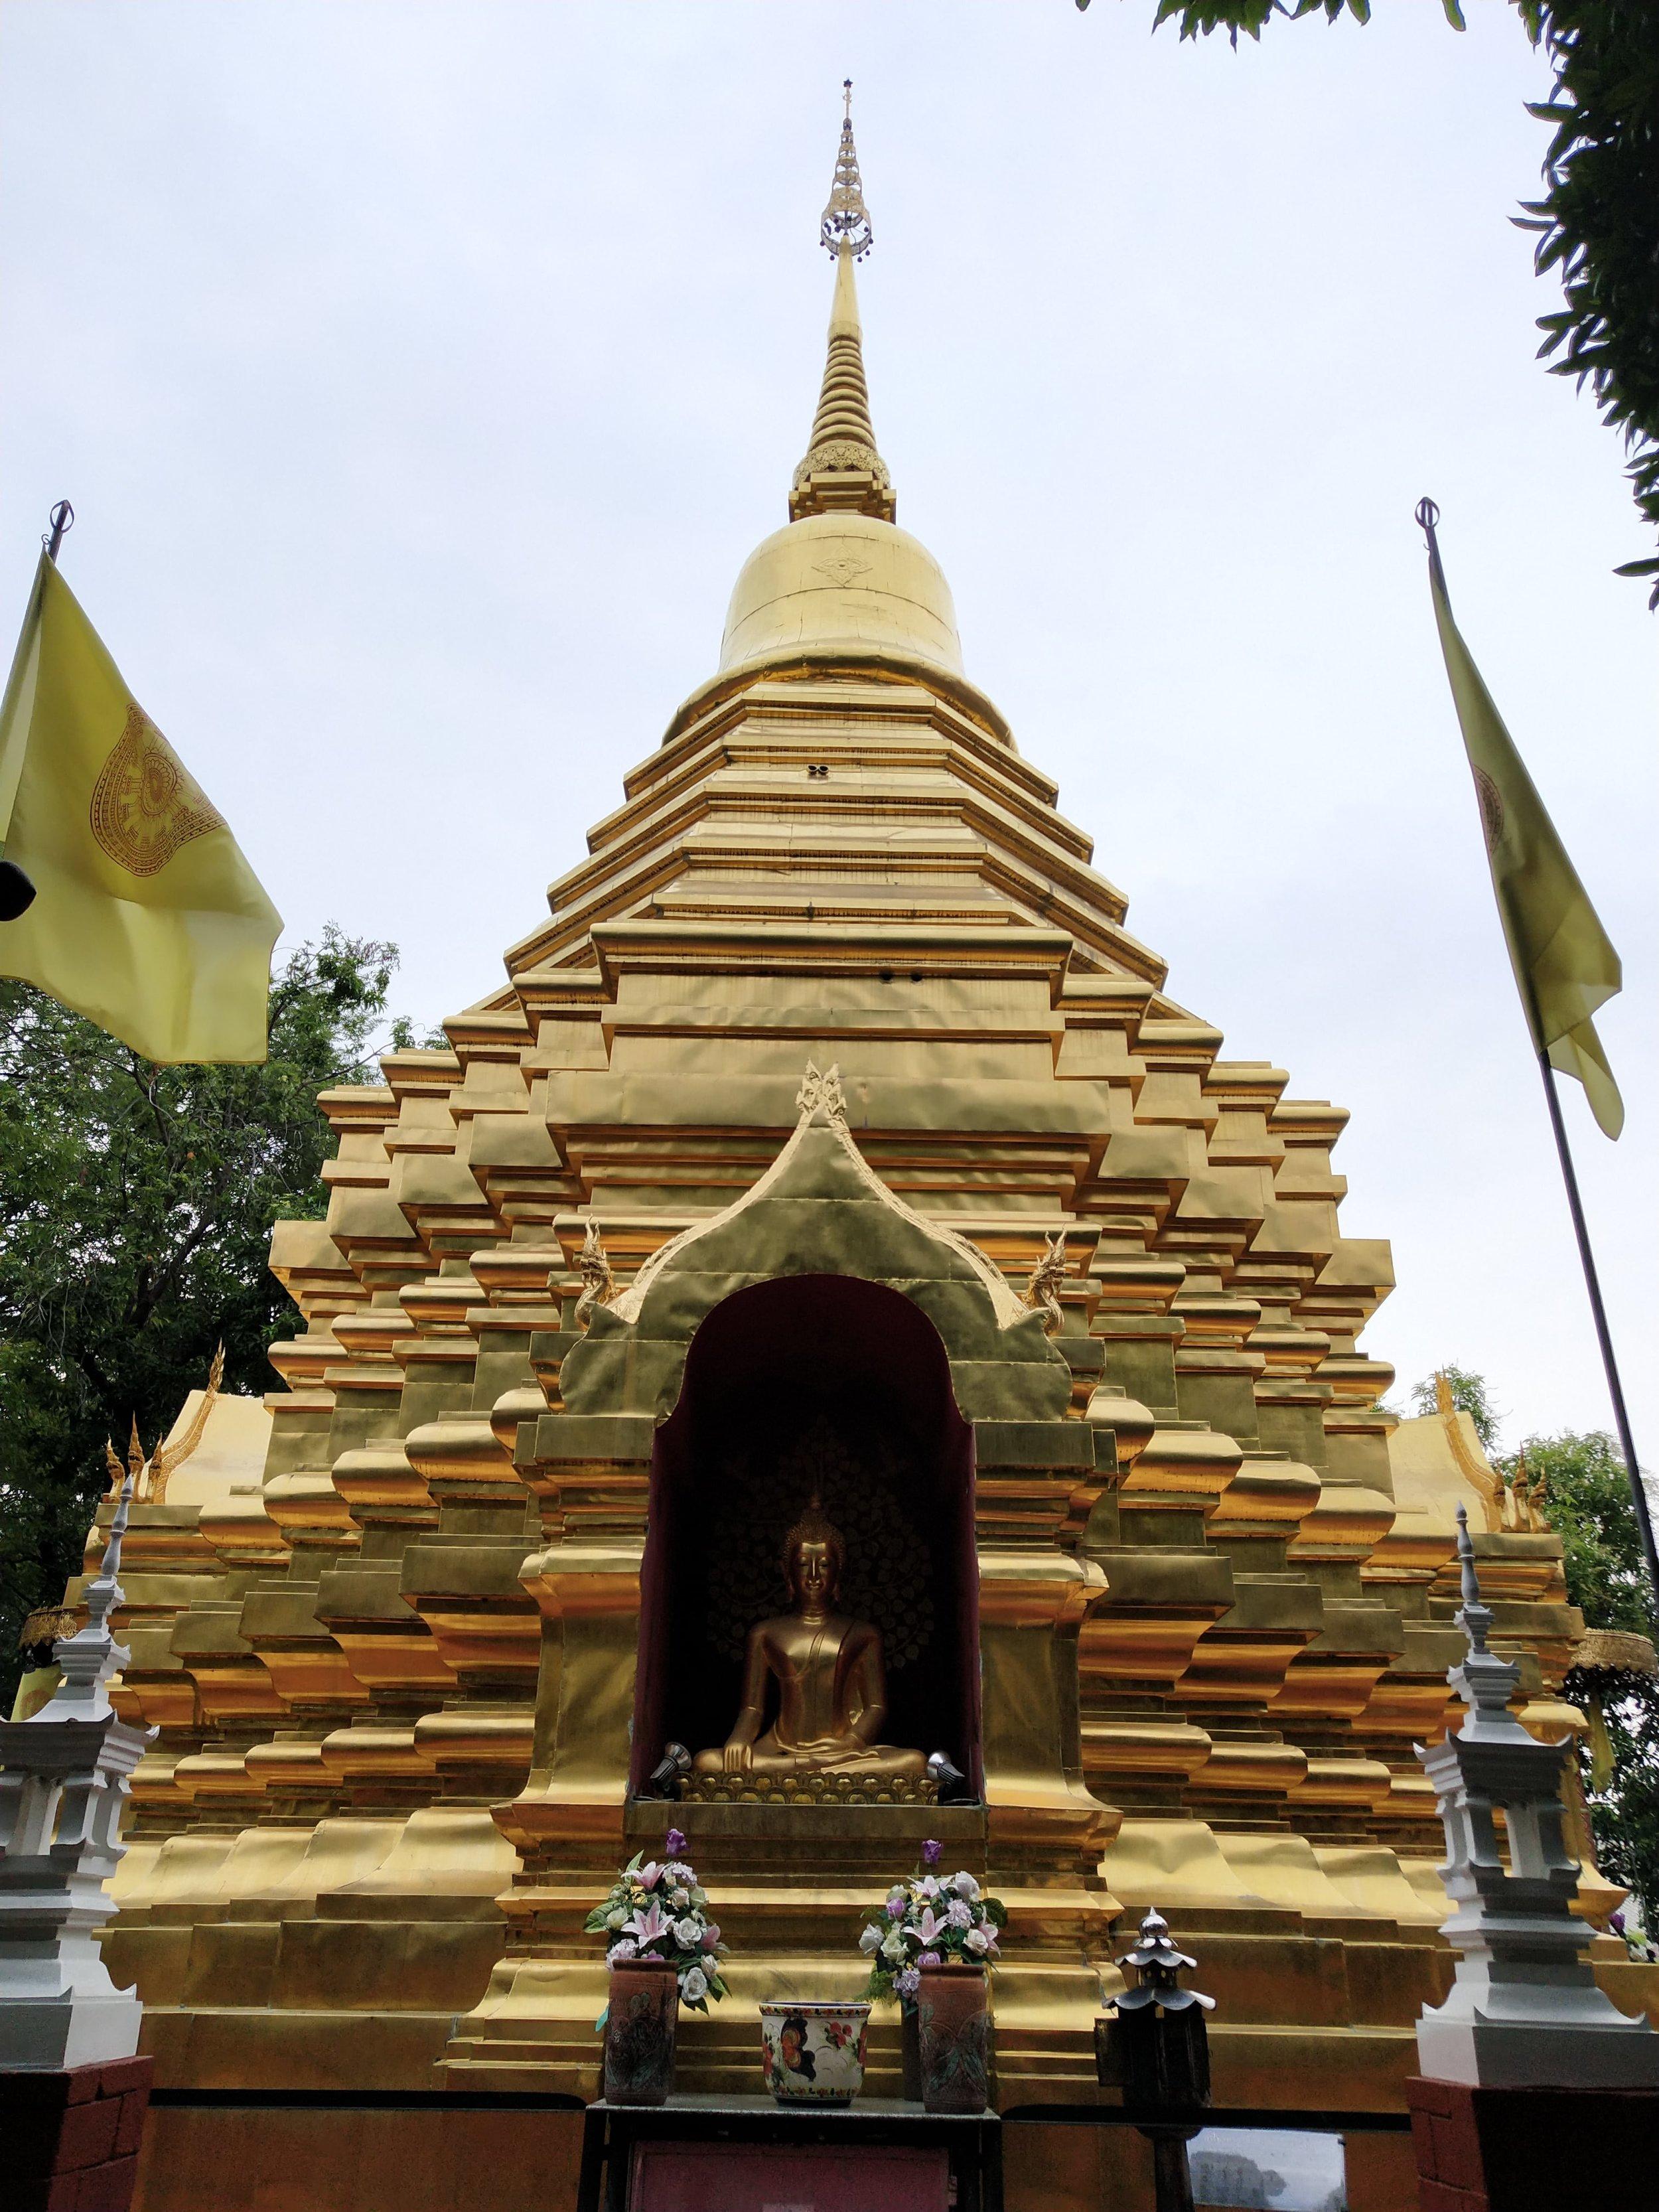 Chiang Mai travel guide 9.jpg